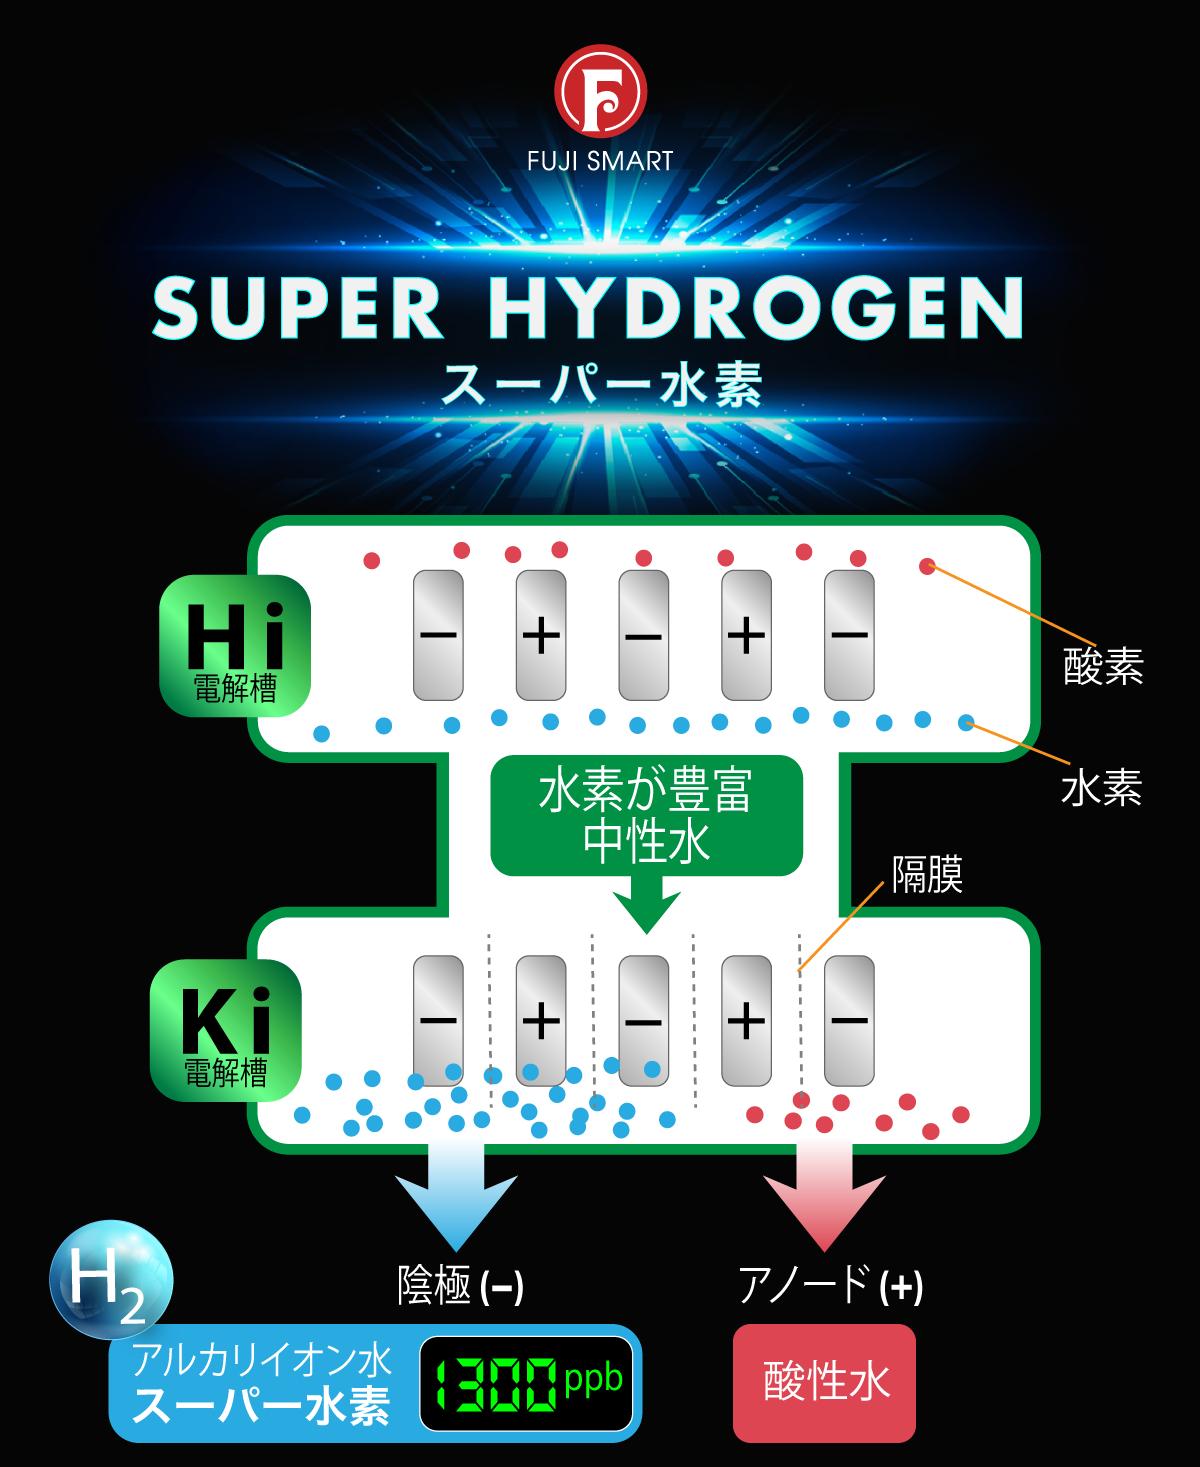 jp7super-hydrogen